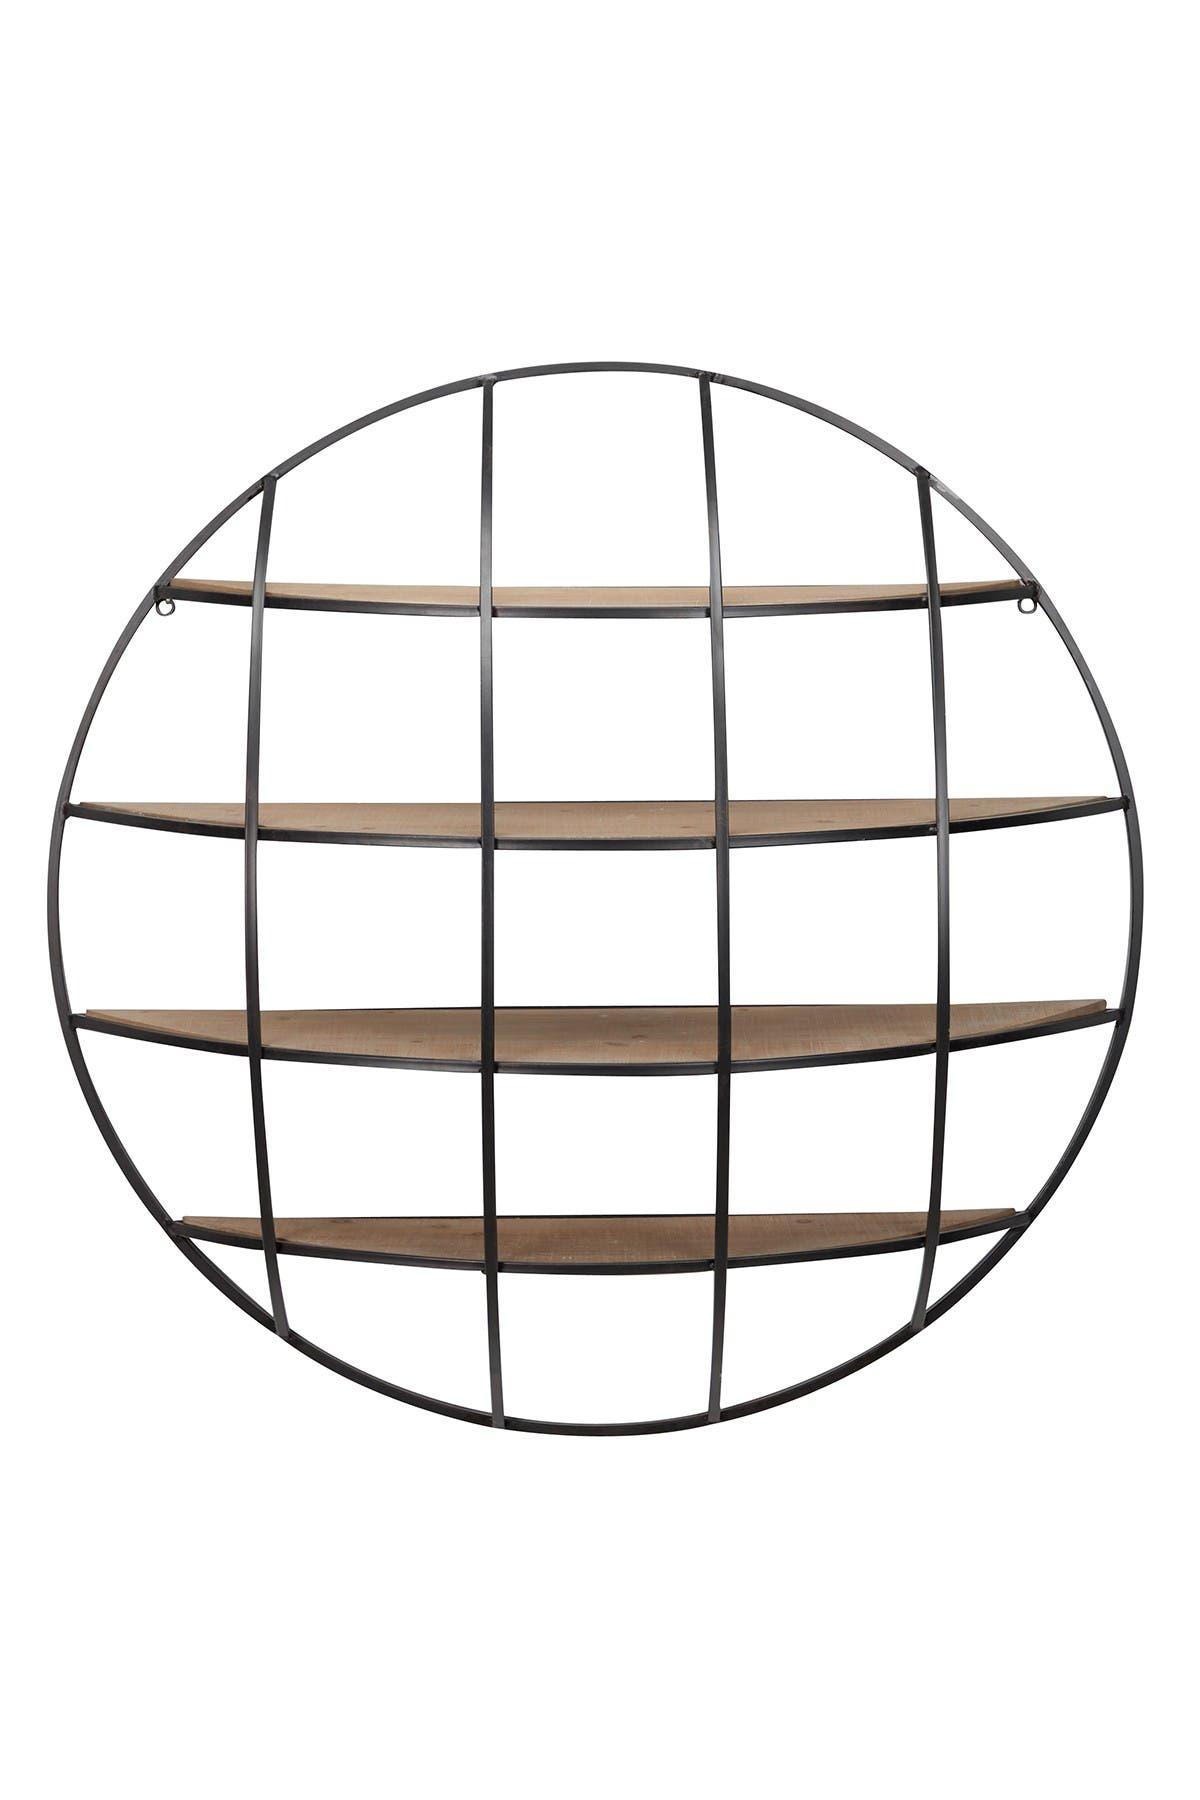 Image of Willow Row Metal & Wood Wall Shelf